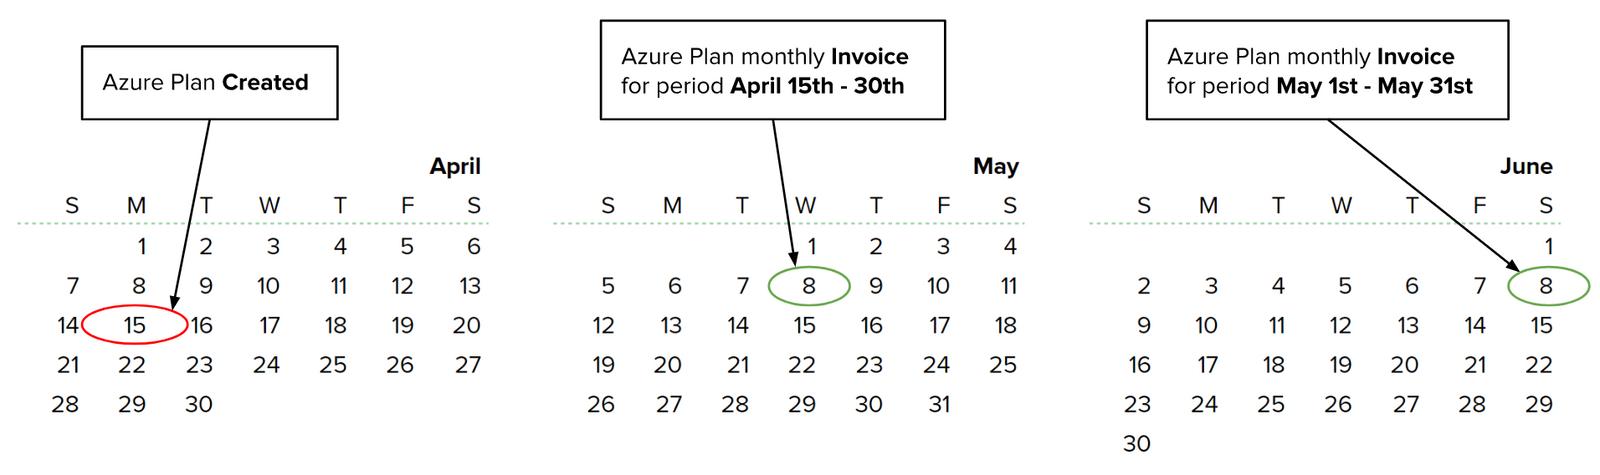 Azure Plan Billing Periods